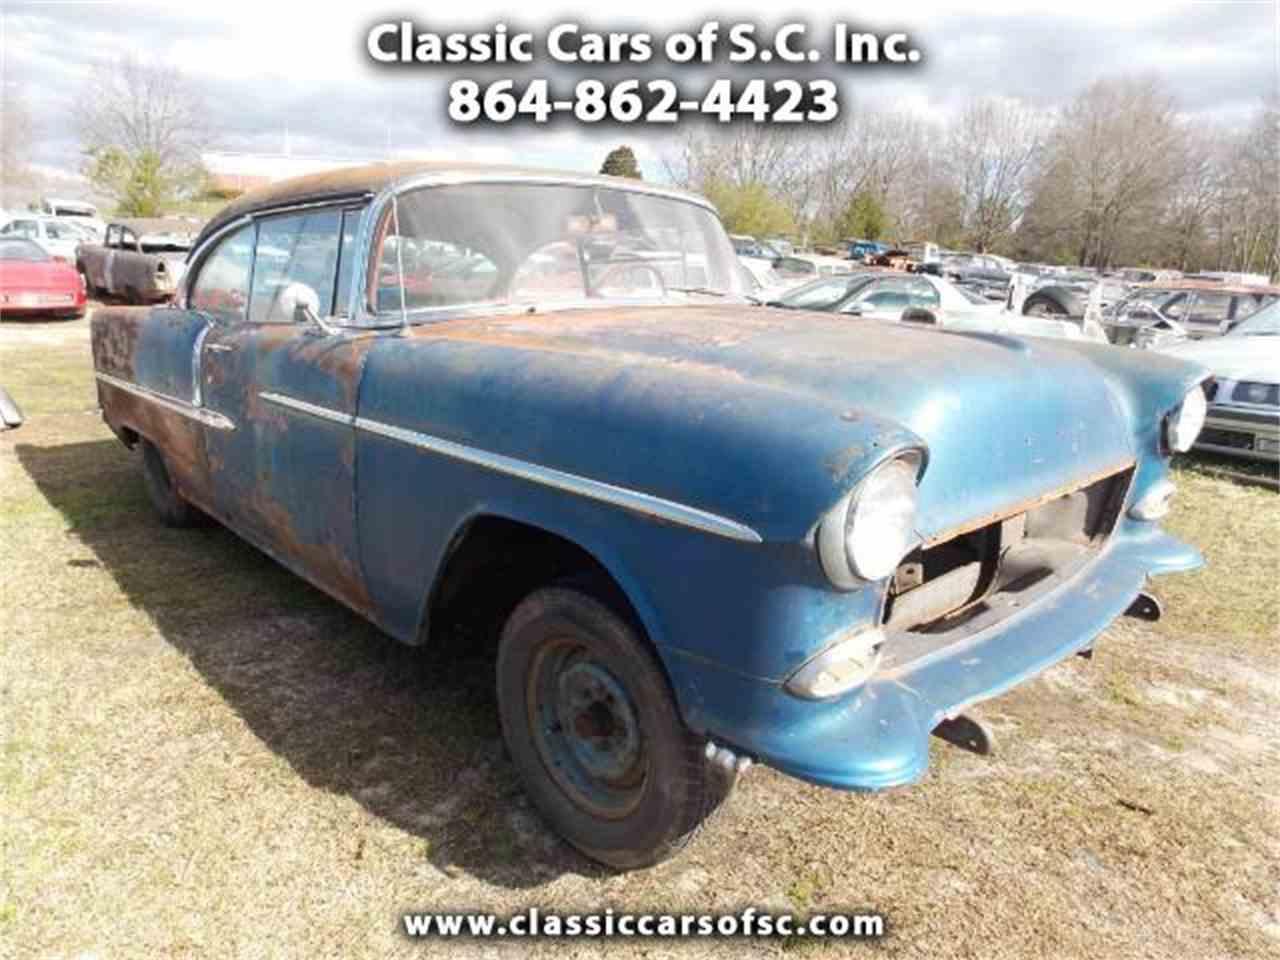 1955 Chevrolet Bel Air for Sale   ClassicCars.com   CC-1077214